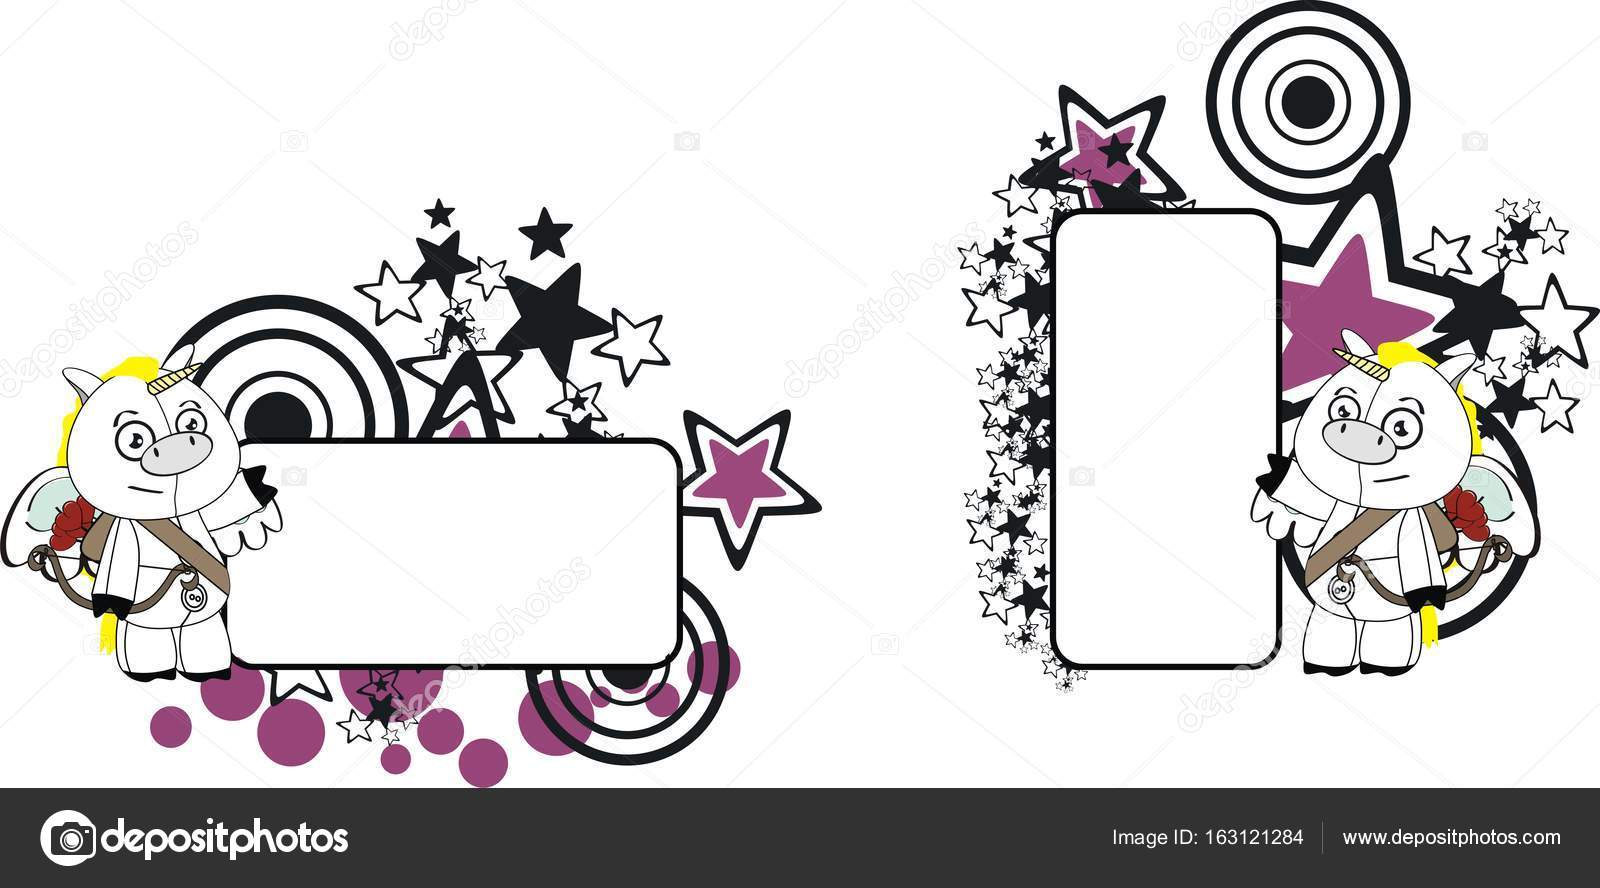 Adorable Petite Licorne Cherubin Ange Dessin Anime Fond Image